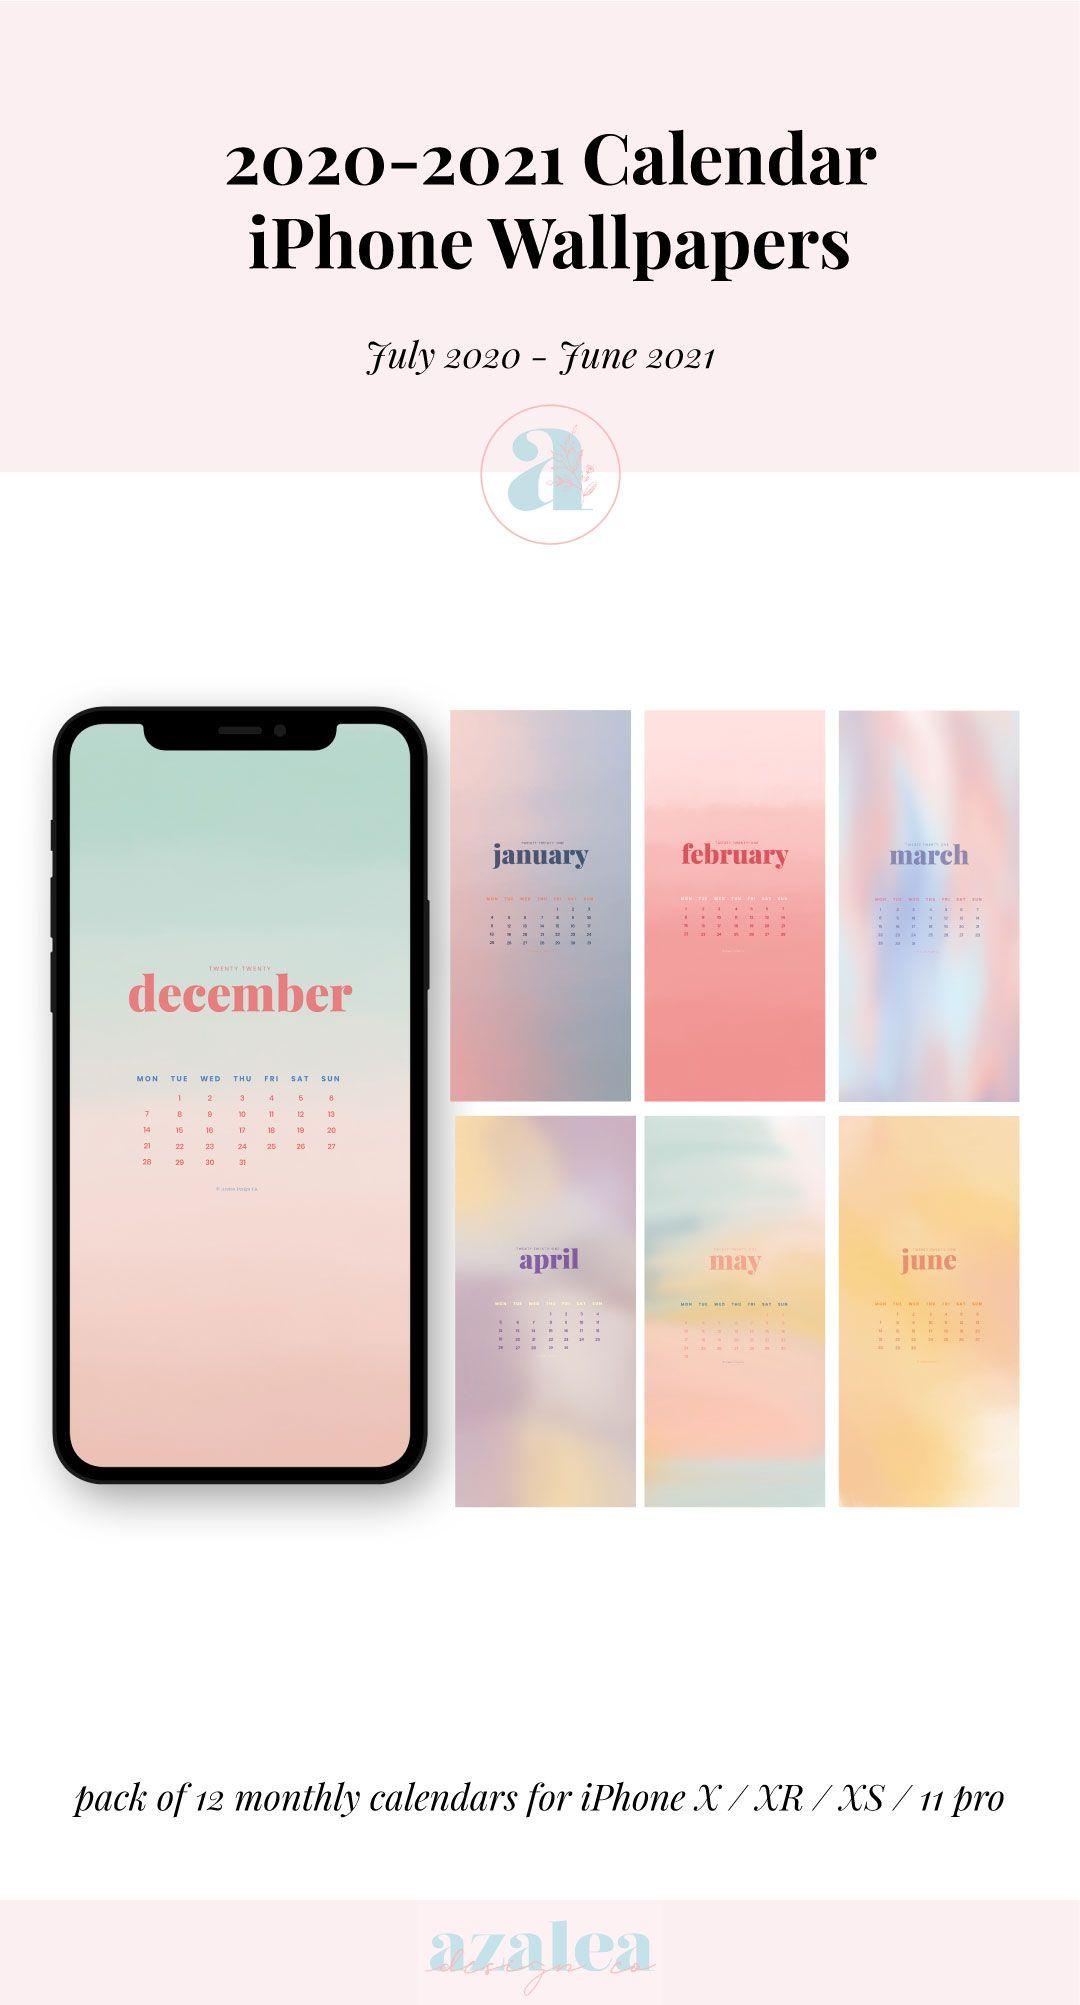 2021 Watercolour iPhone Calendars Phone Wallpaper Instant Etsy 1080x2005